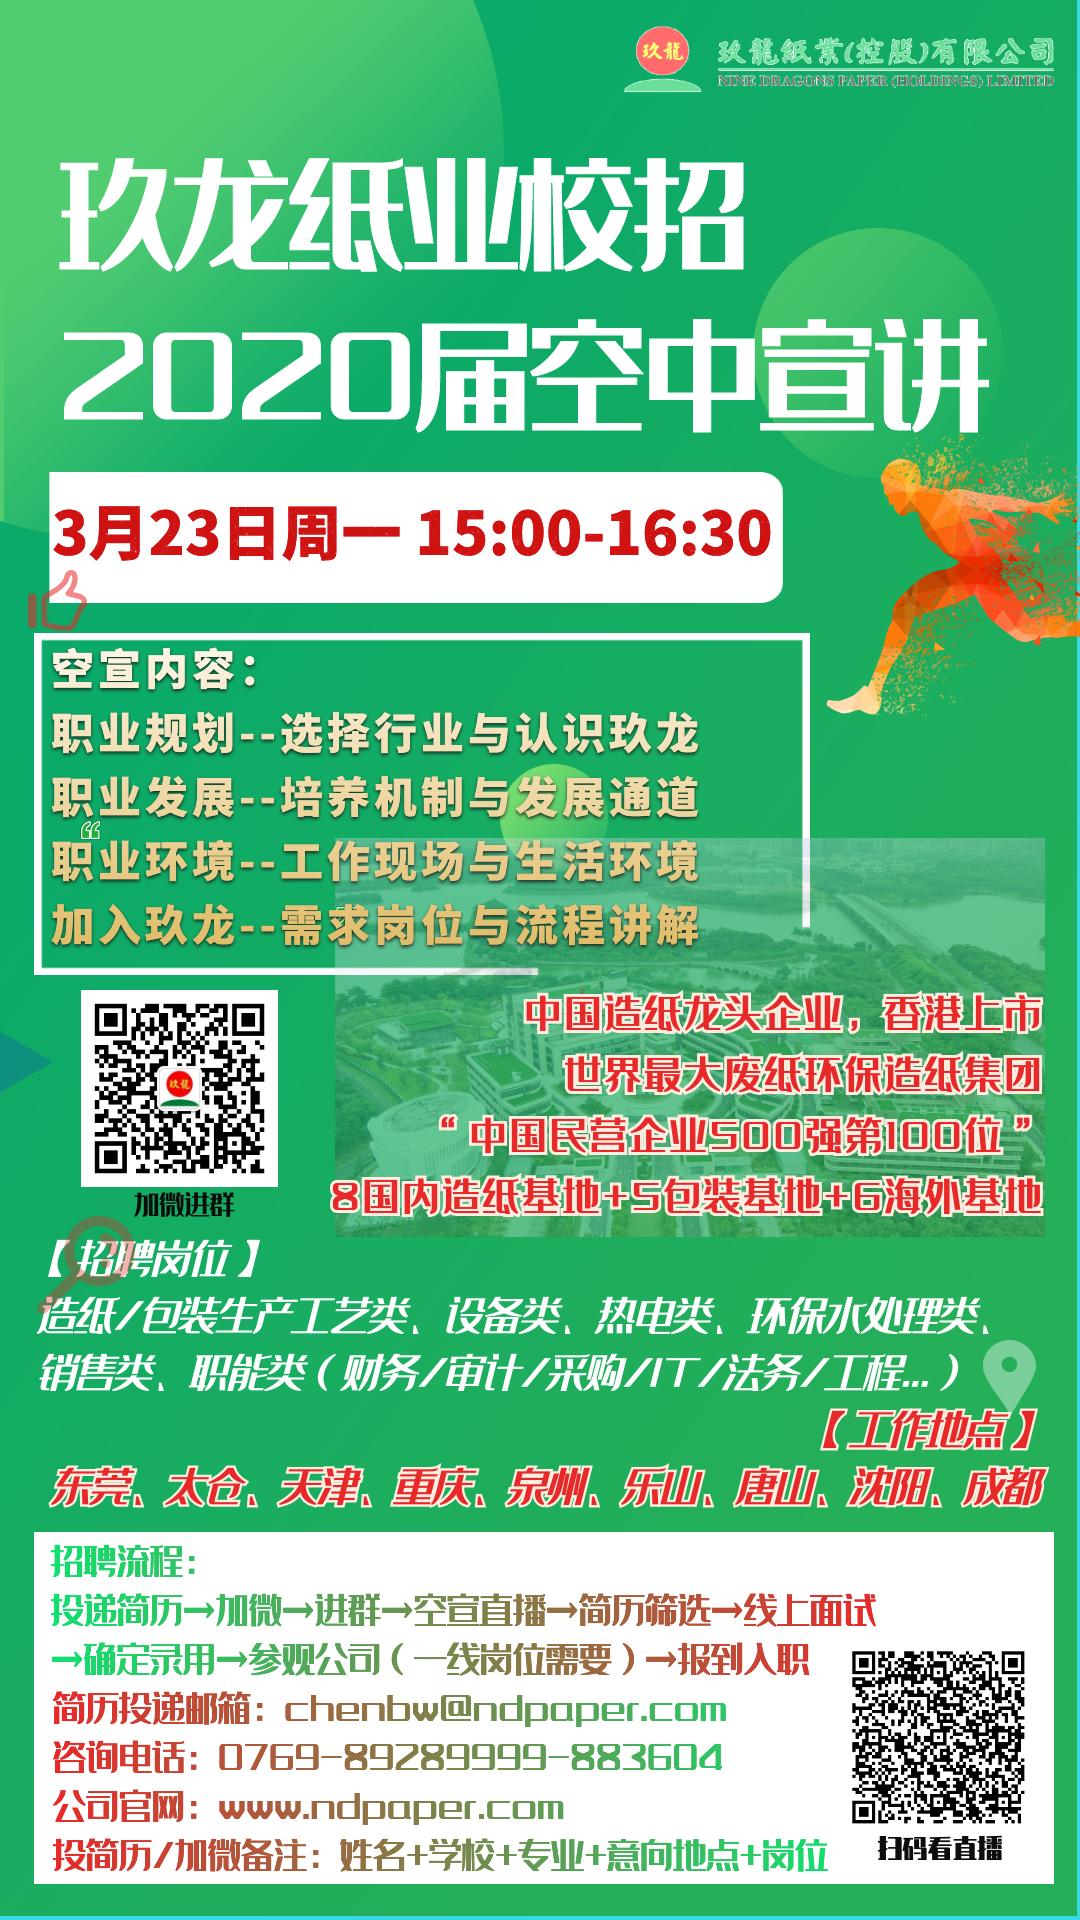 3.23空宣海报.png